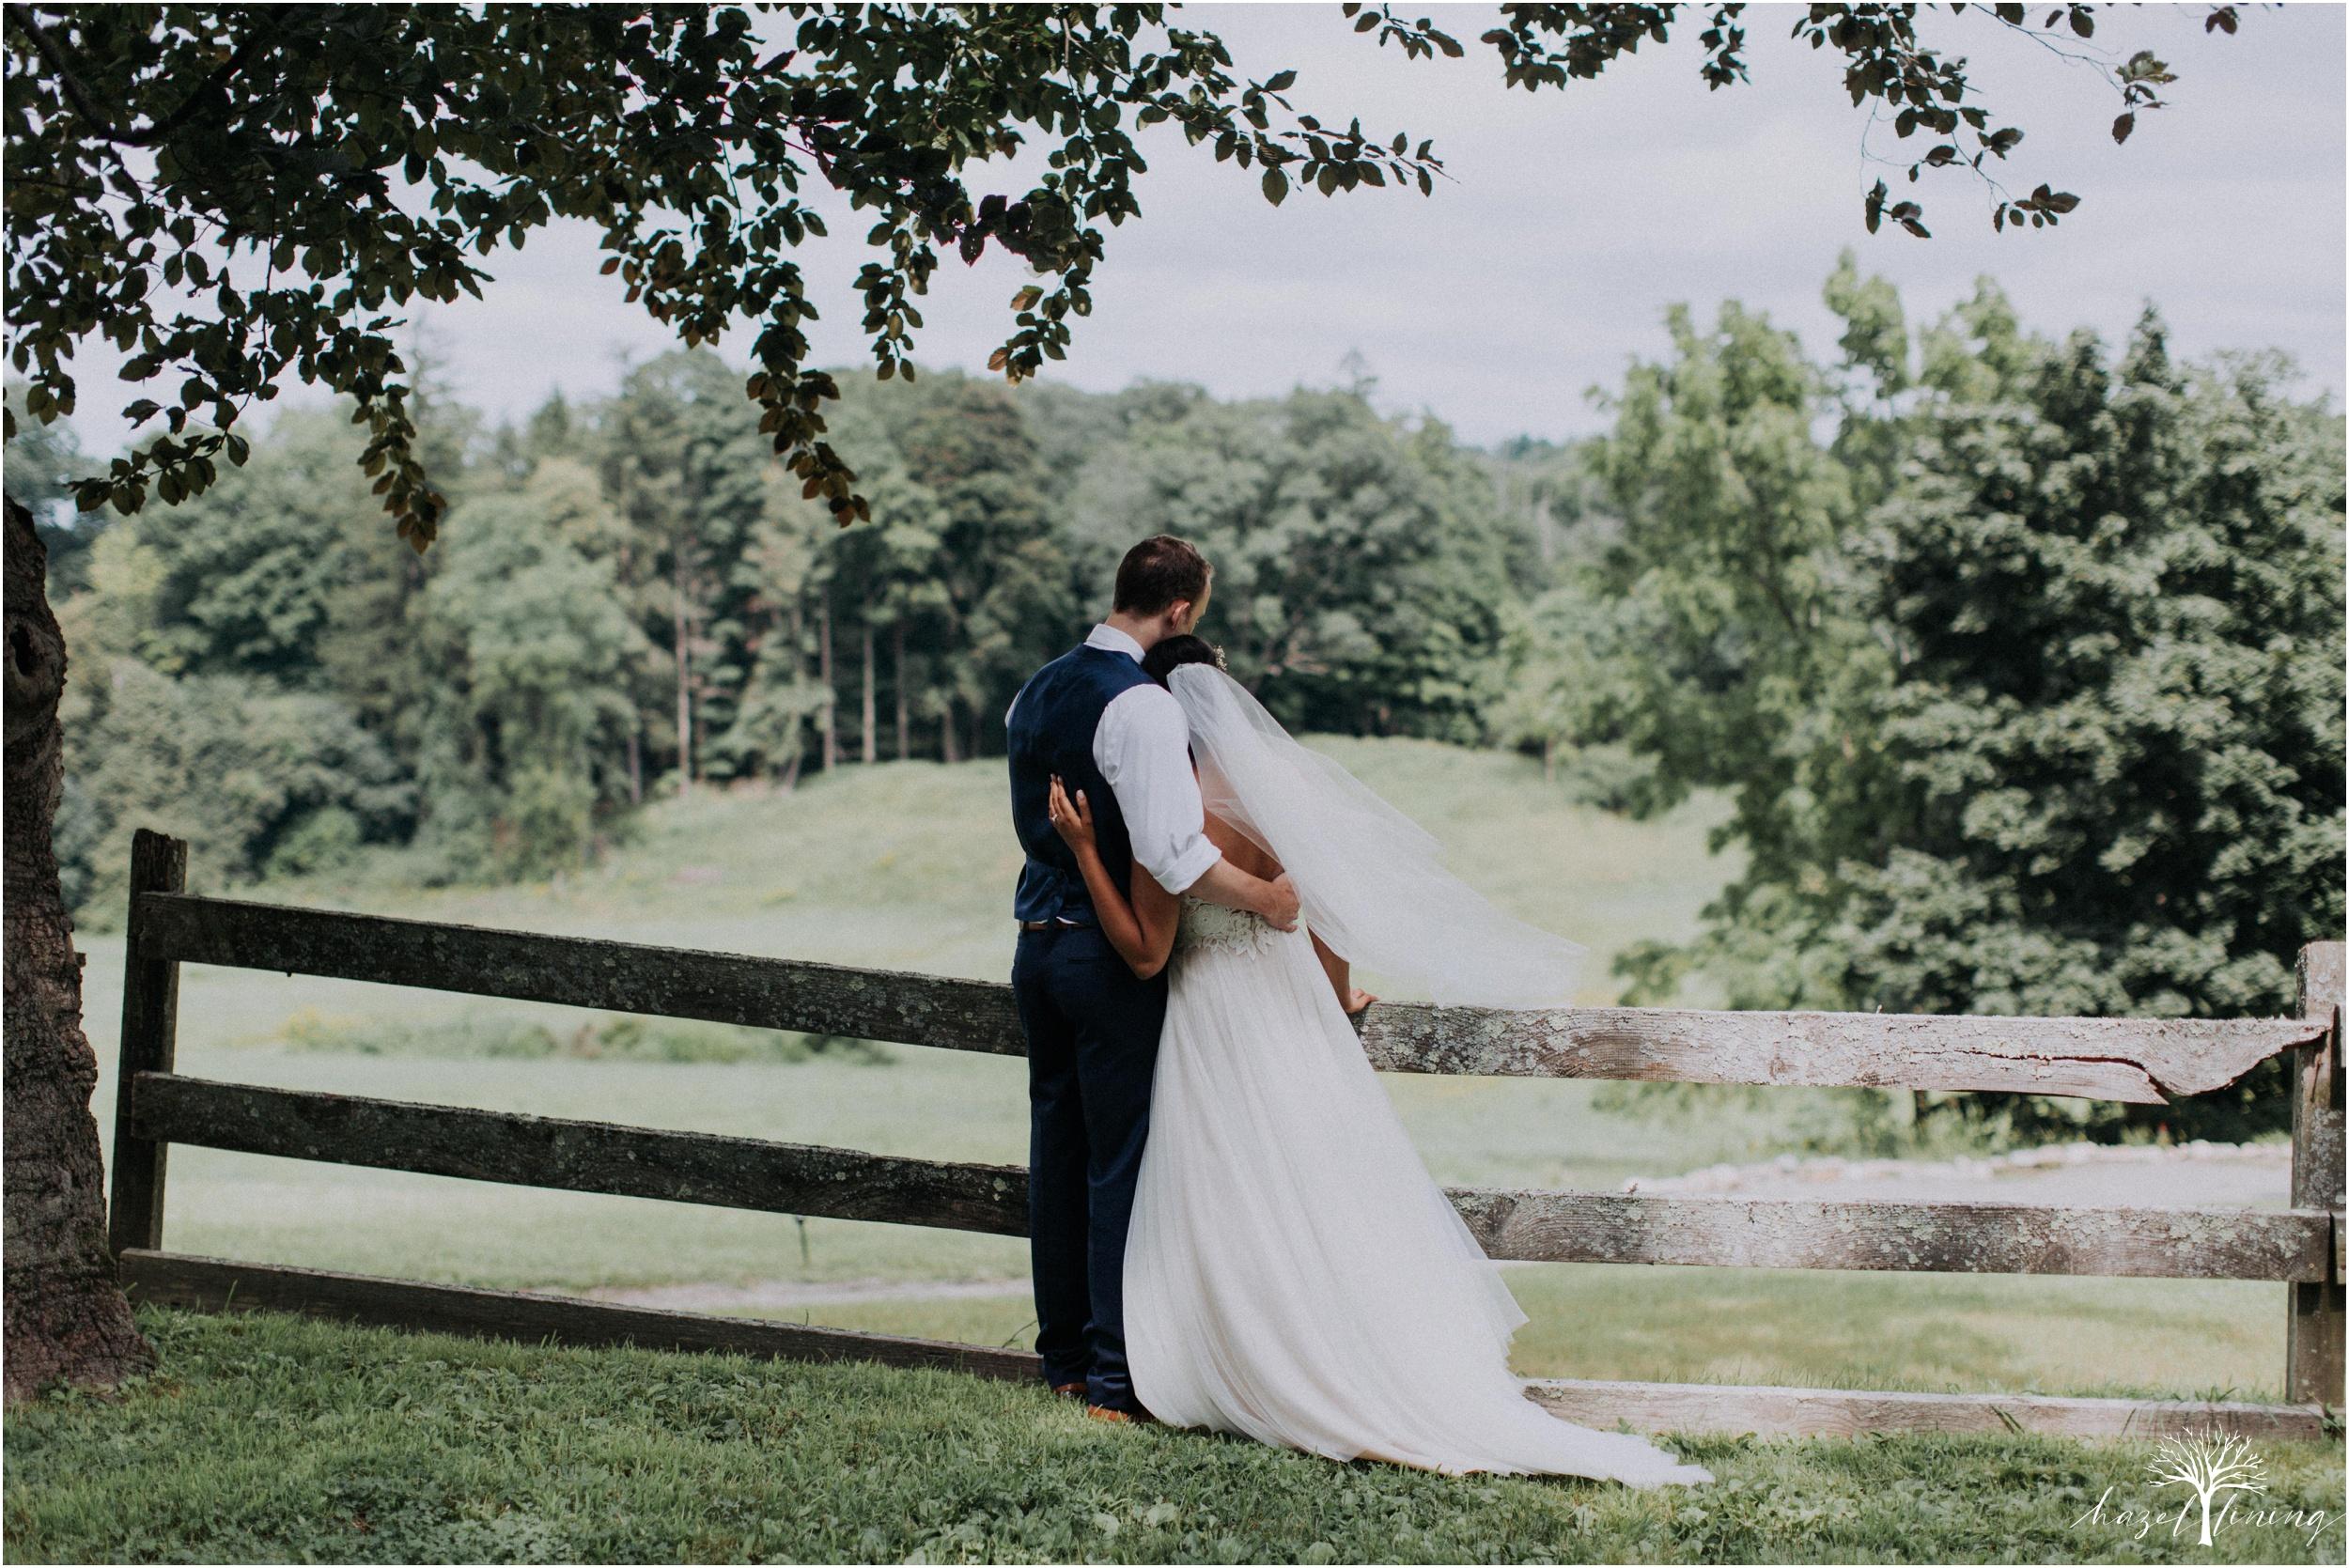 mariah-kreyling-samuel-sherratt-sherrattwiththeworld-peirce-farm-at-witch-hill-boston-massachusetts-wedding-photography-hazel-lining-travel-wedding-elopement-photography_0144.jpg